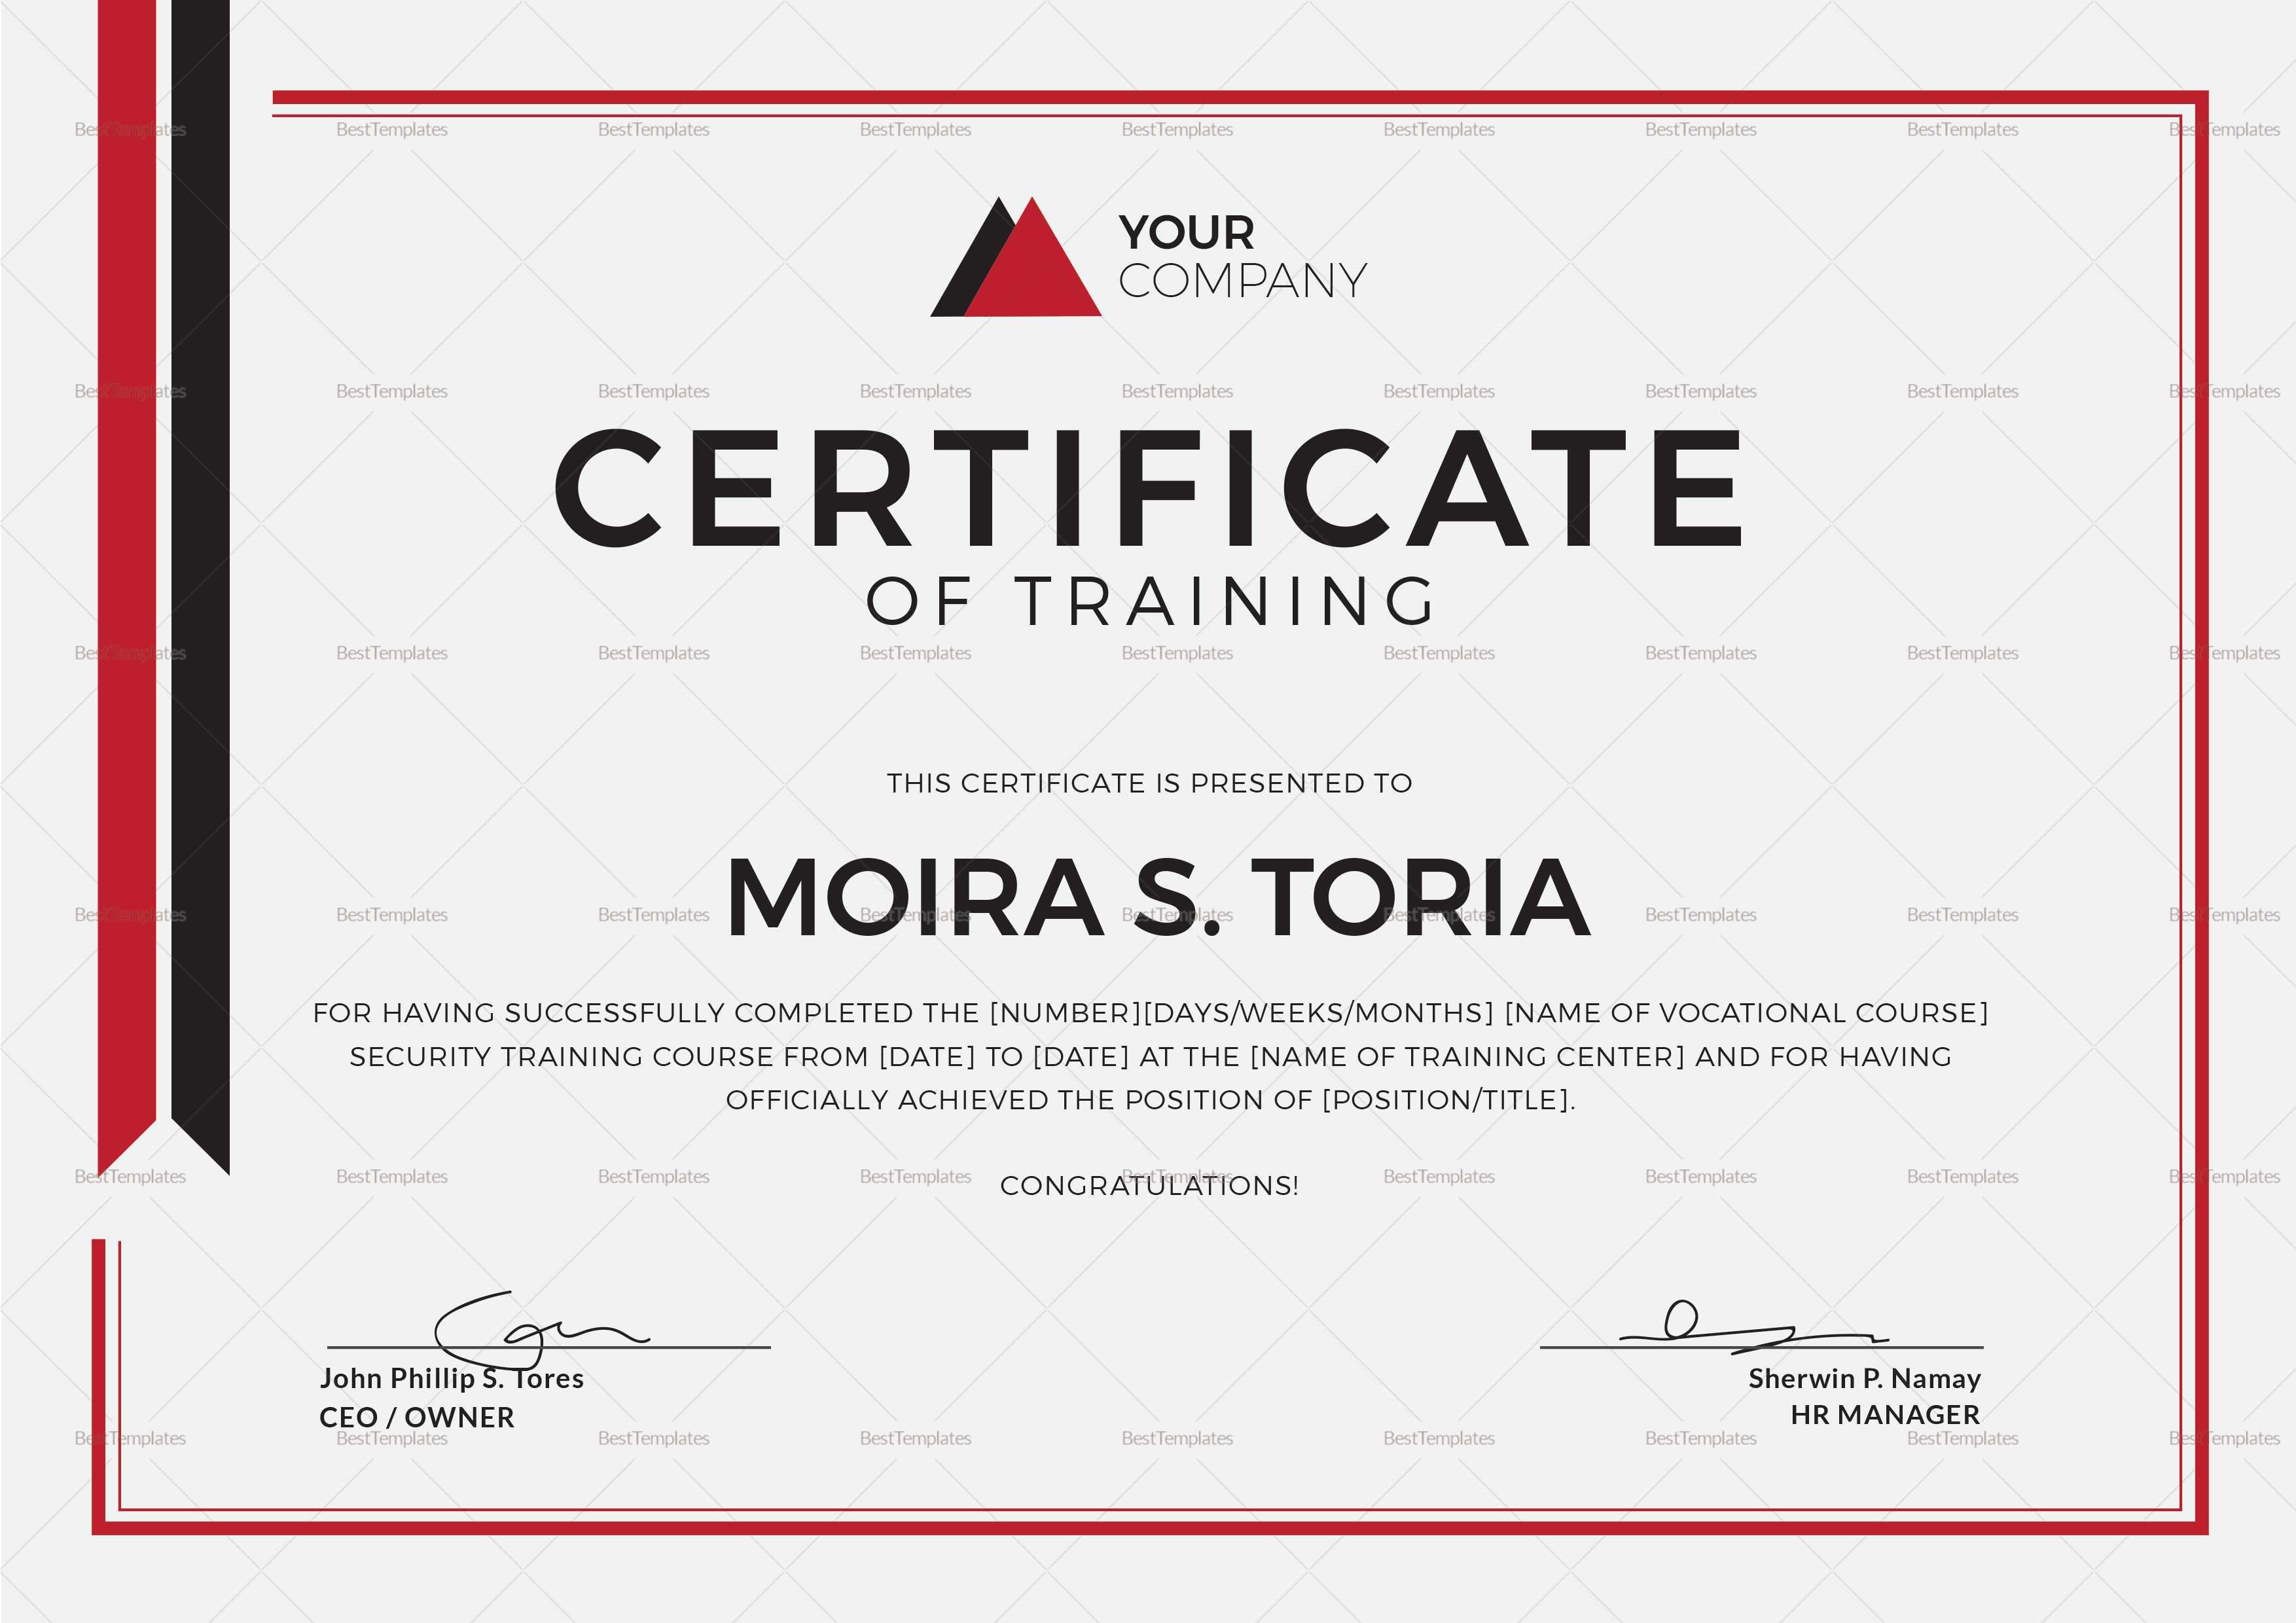 Security Training Certificate Template Throughout Template For Training Certificate